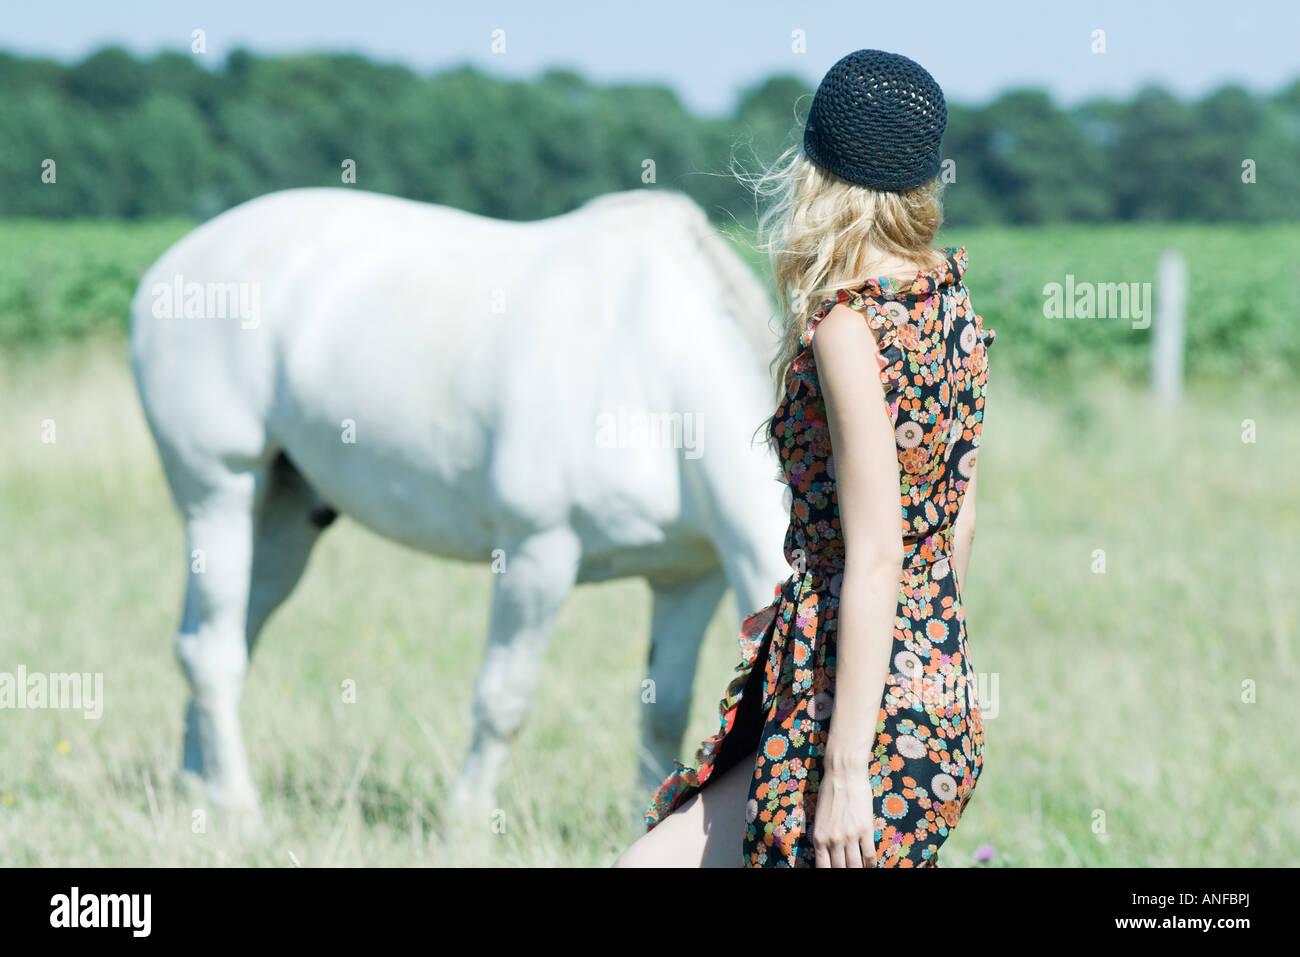 Young woman walking toward horse, rear view - Stock Image